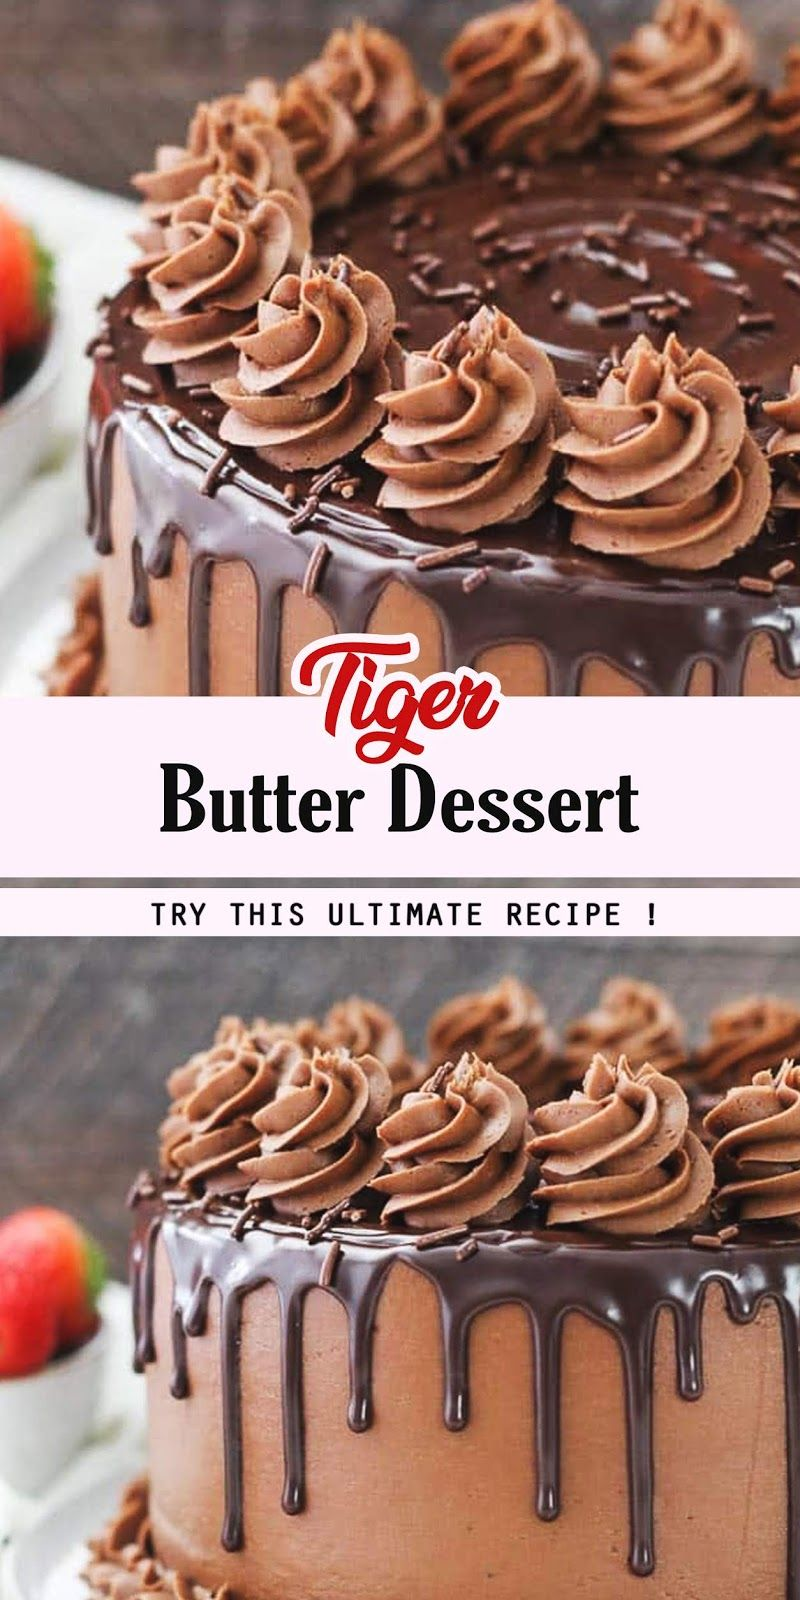 Chocolate Layer Cake In 2020 Best Dessert Recipes Chocolate Layer Cake Desserts